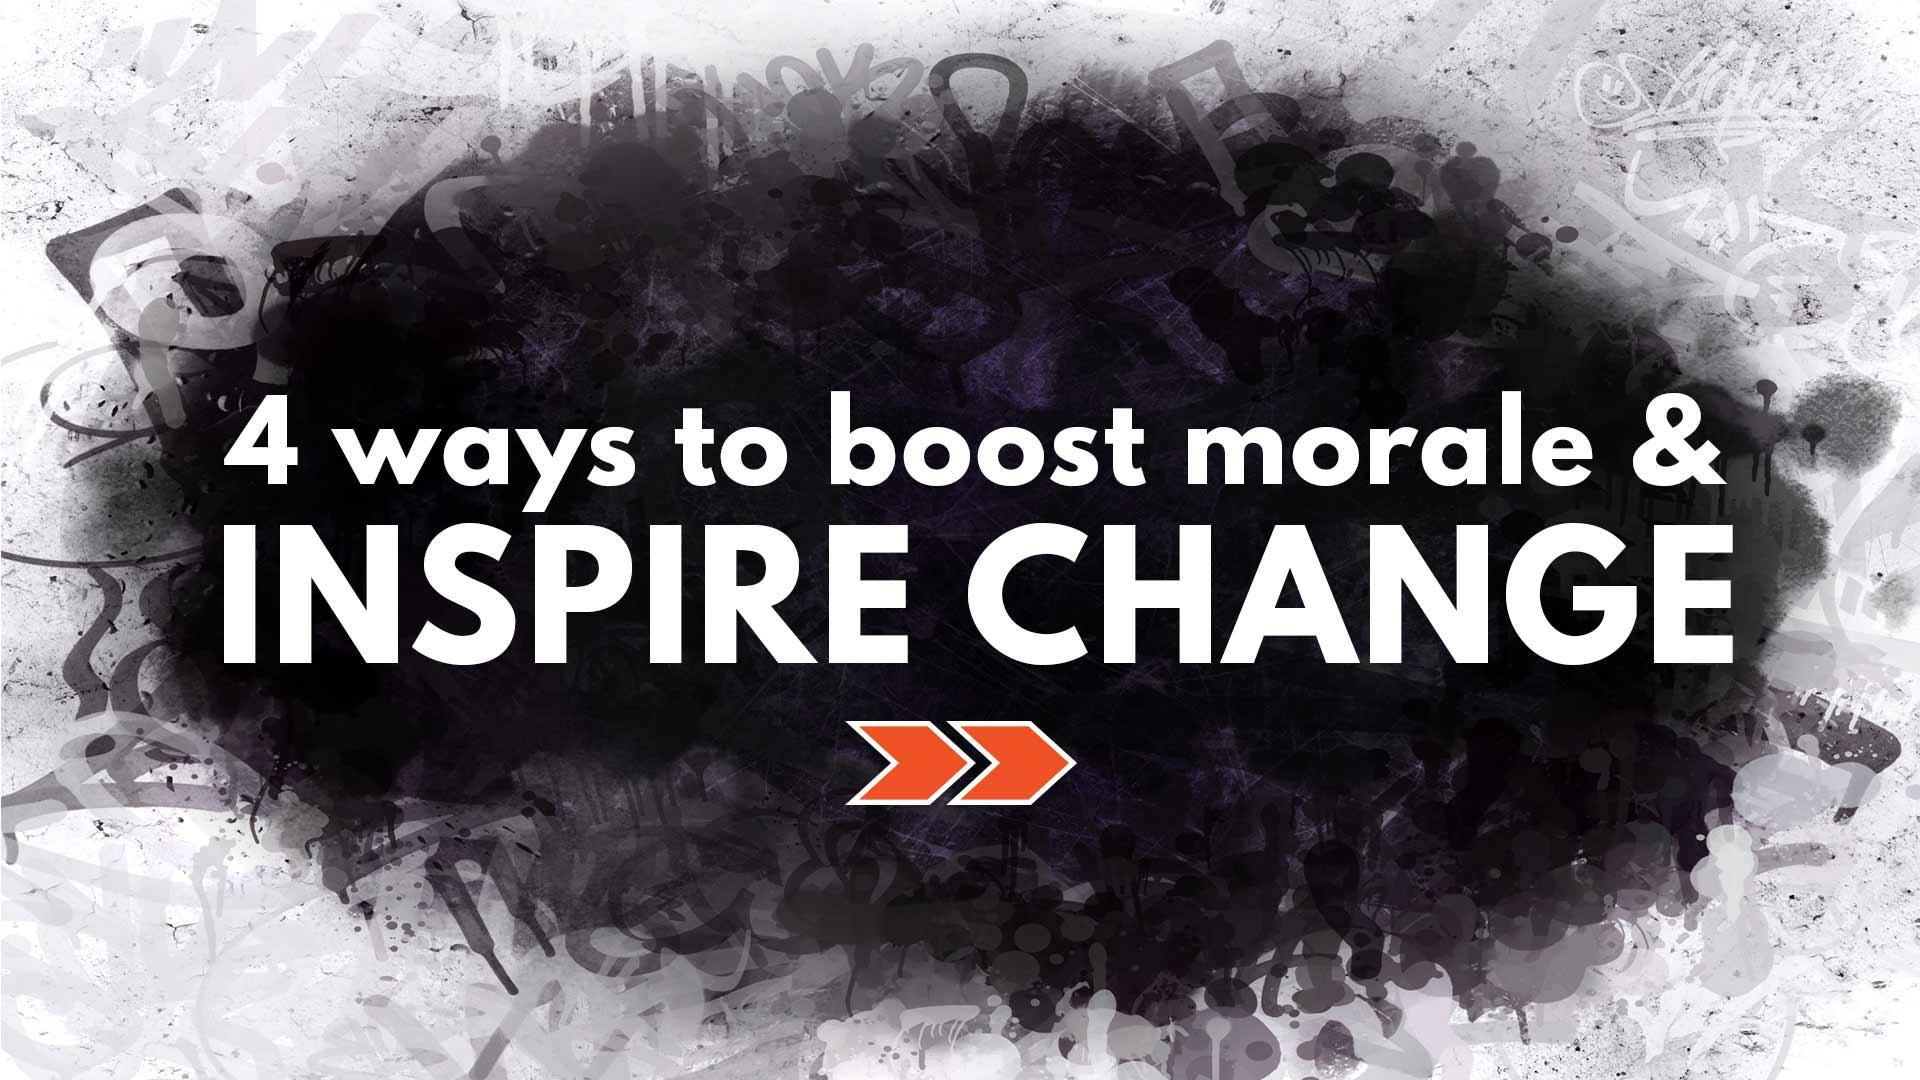 4 Ways to Improve Morale & Inspire Change